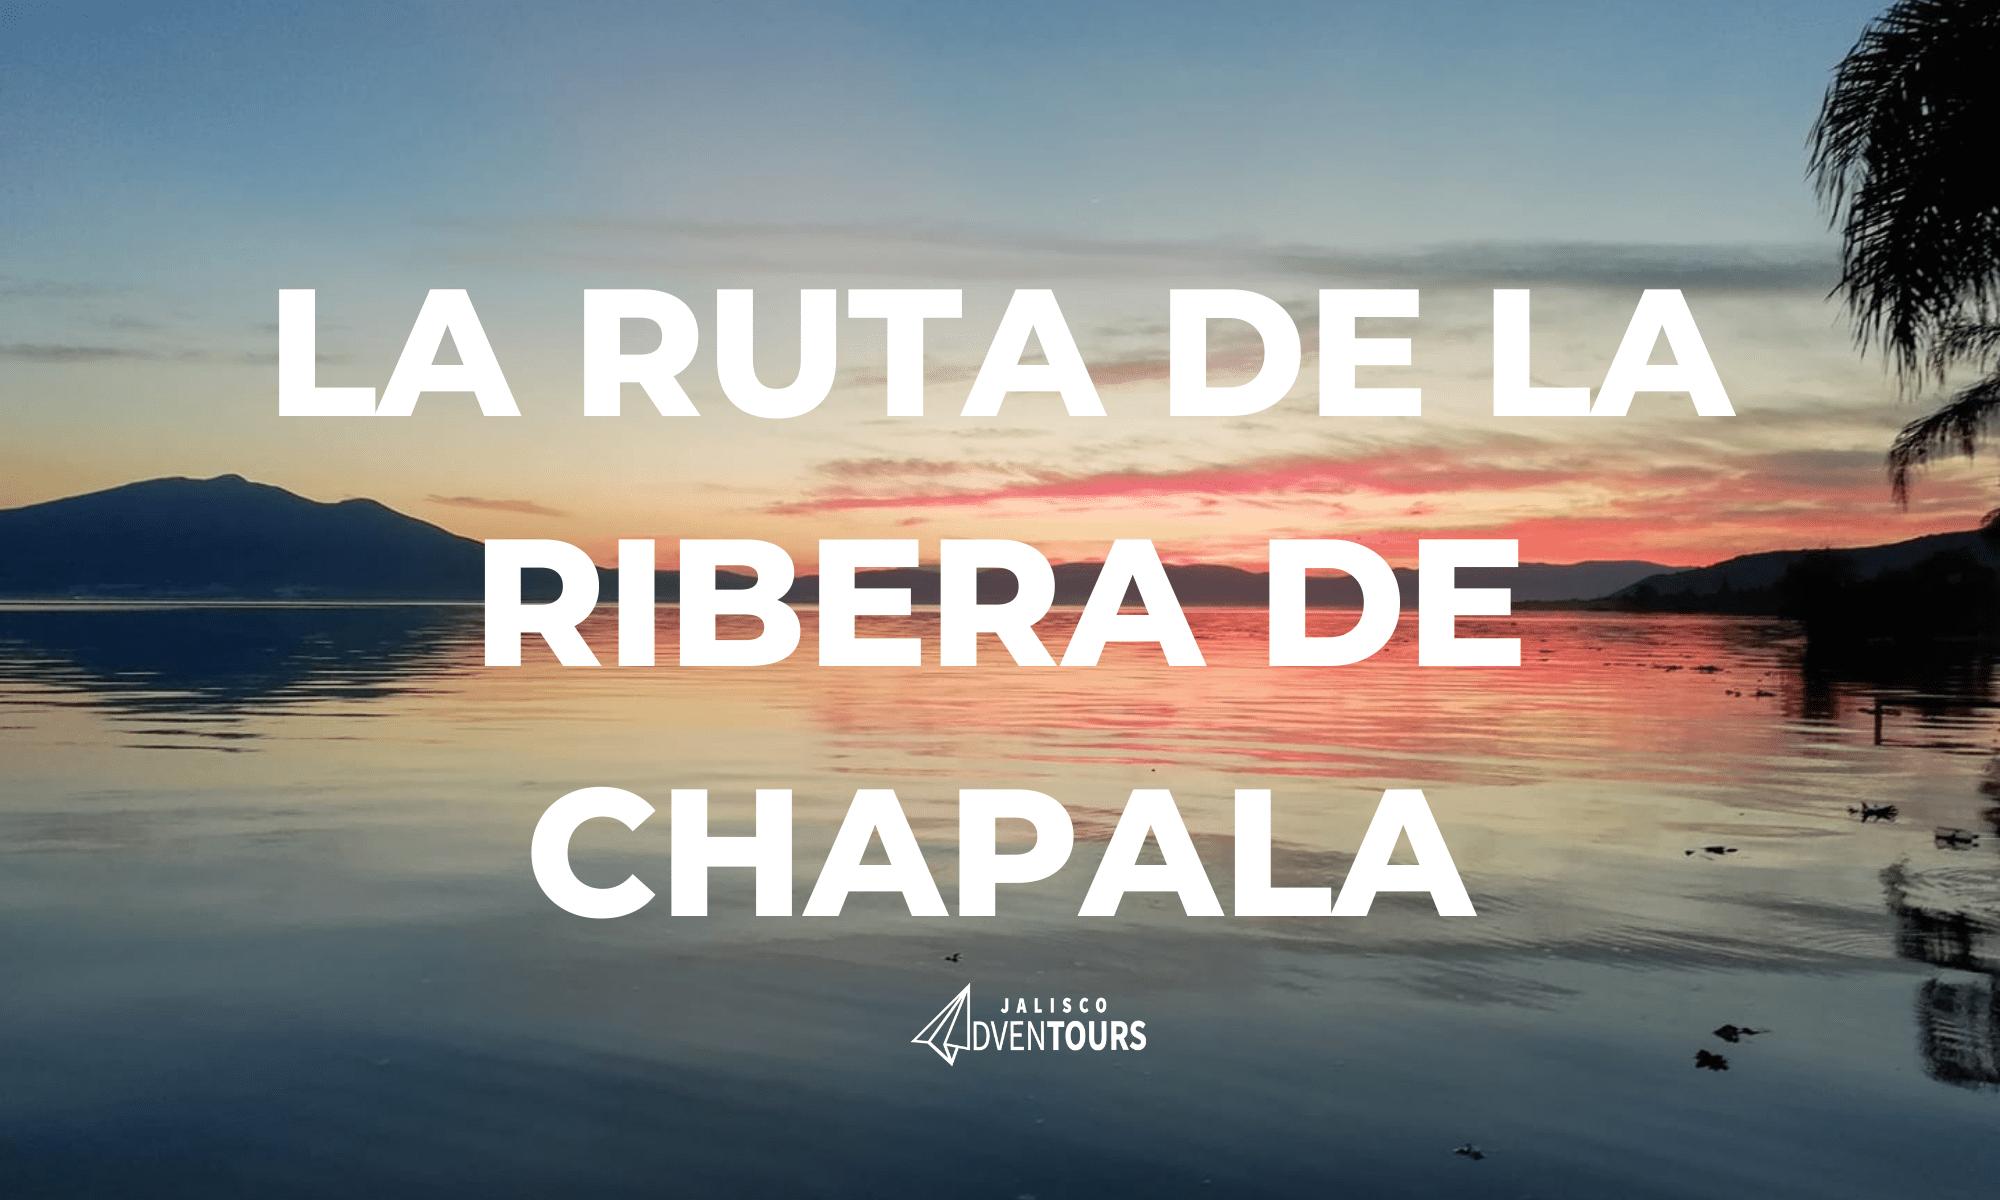 La ruta de la ribera de Chapala